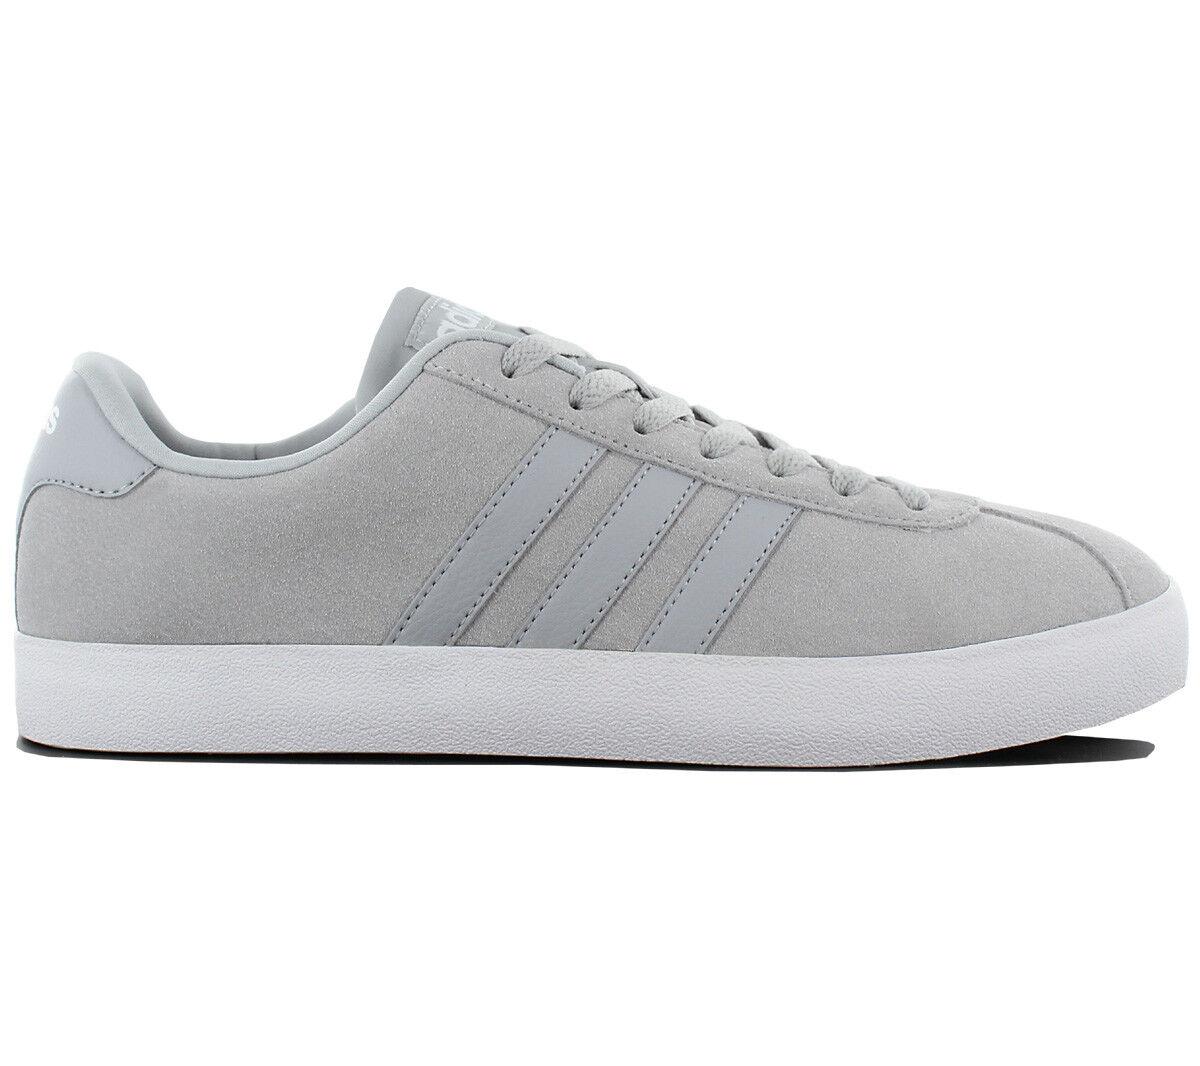 Adidas VL Sneaker Court Vulc Schuhe Herren Sneaker VL Leder Grau Turnschuhe Freizeit W3926 67cd78